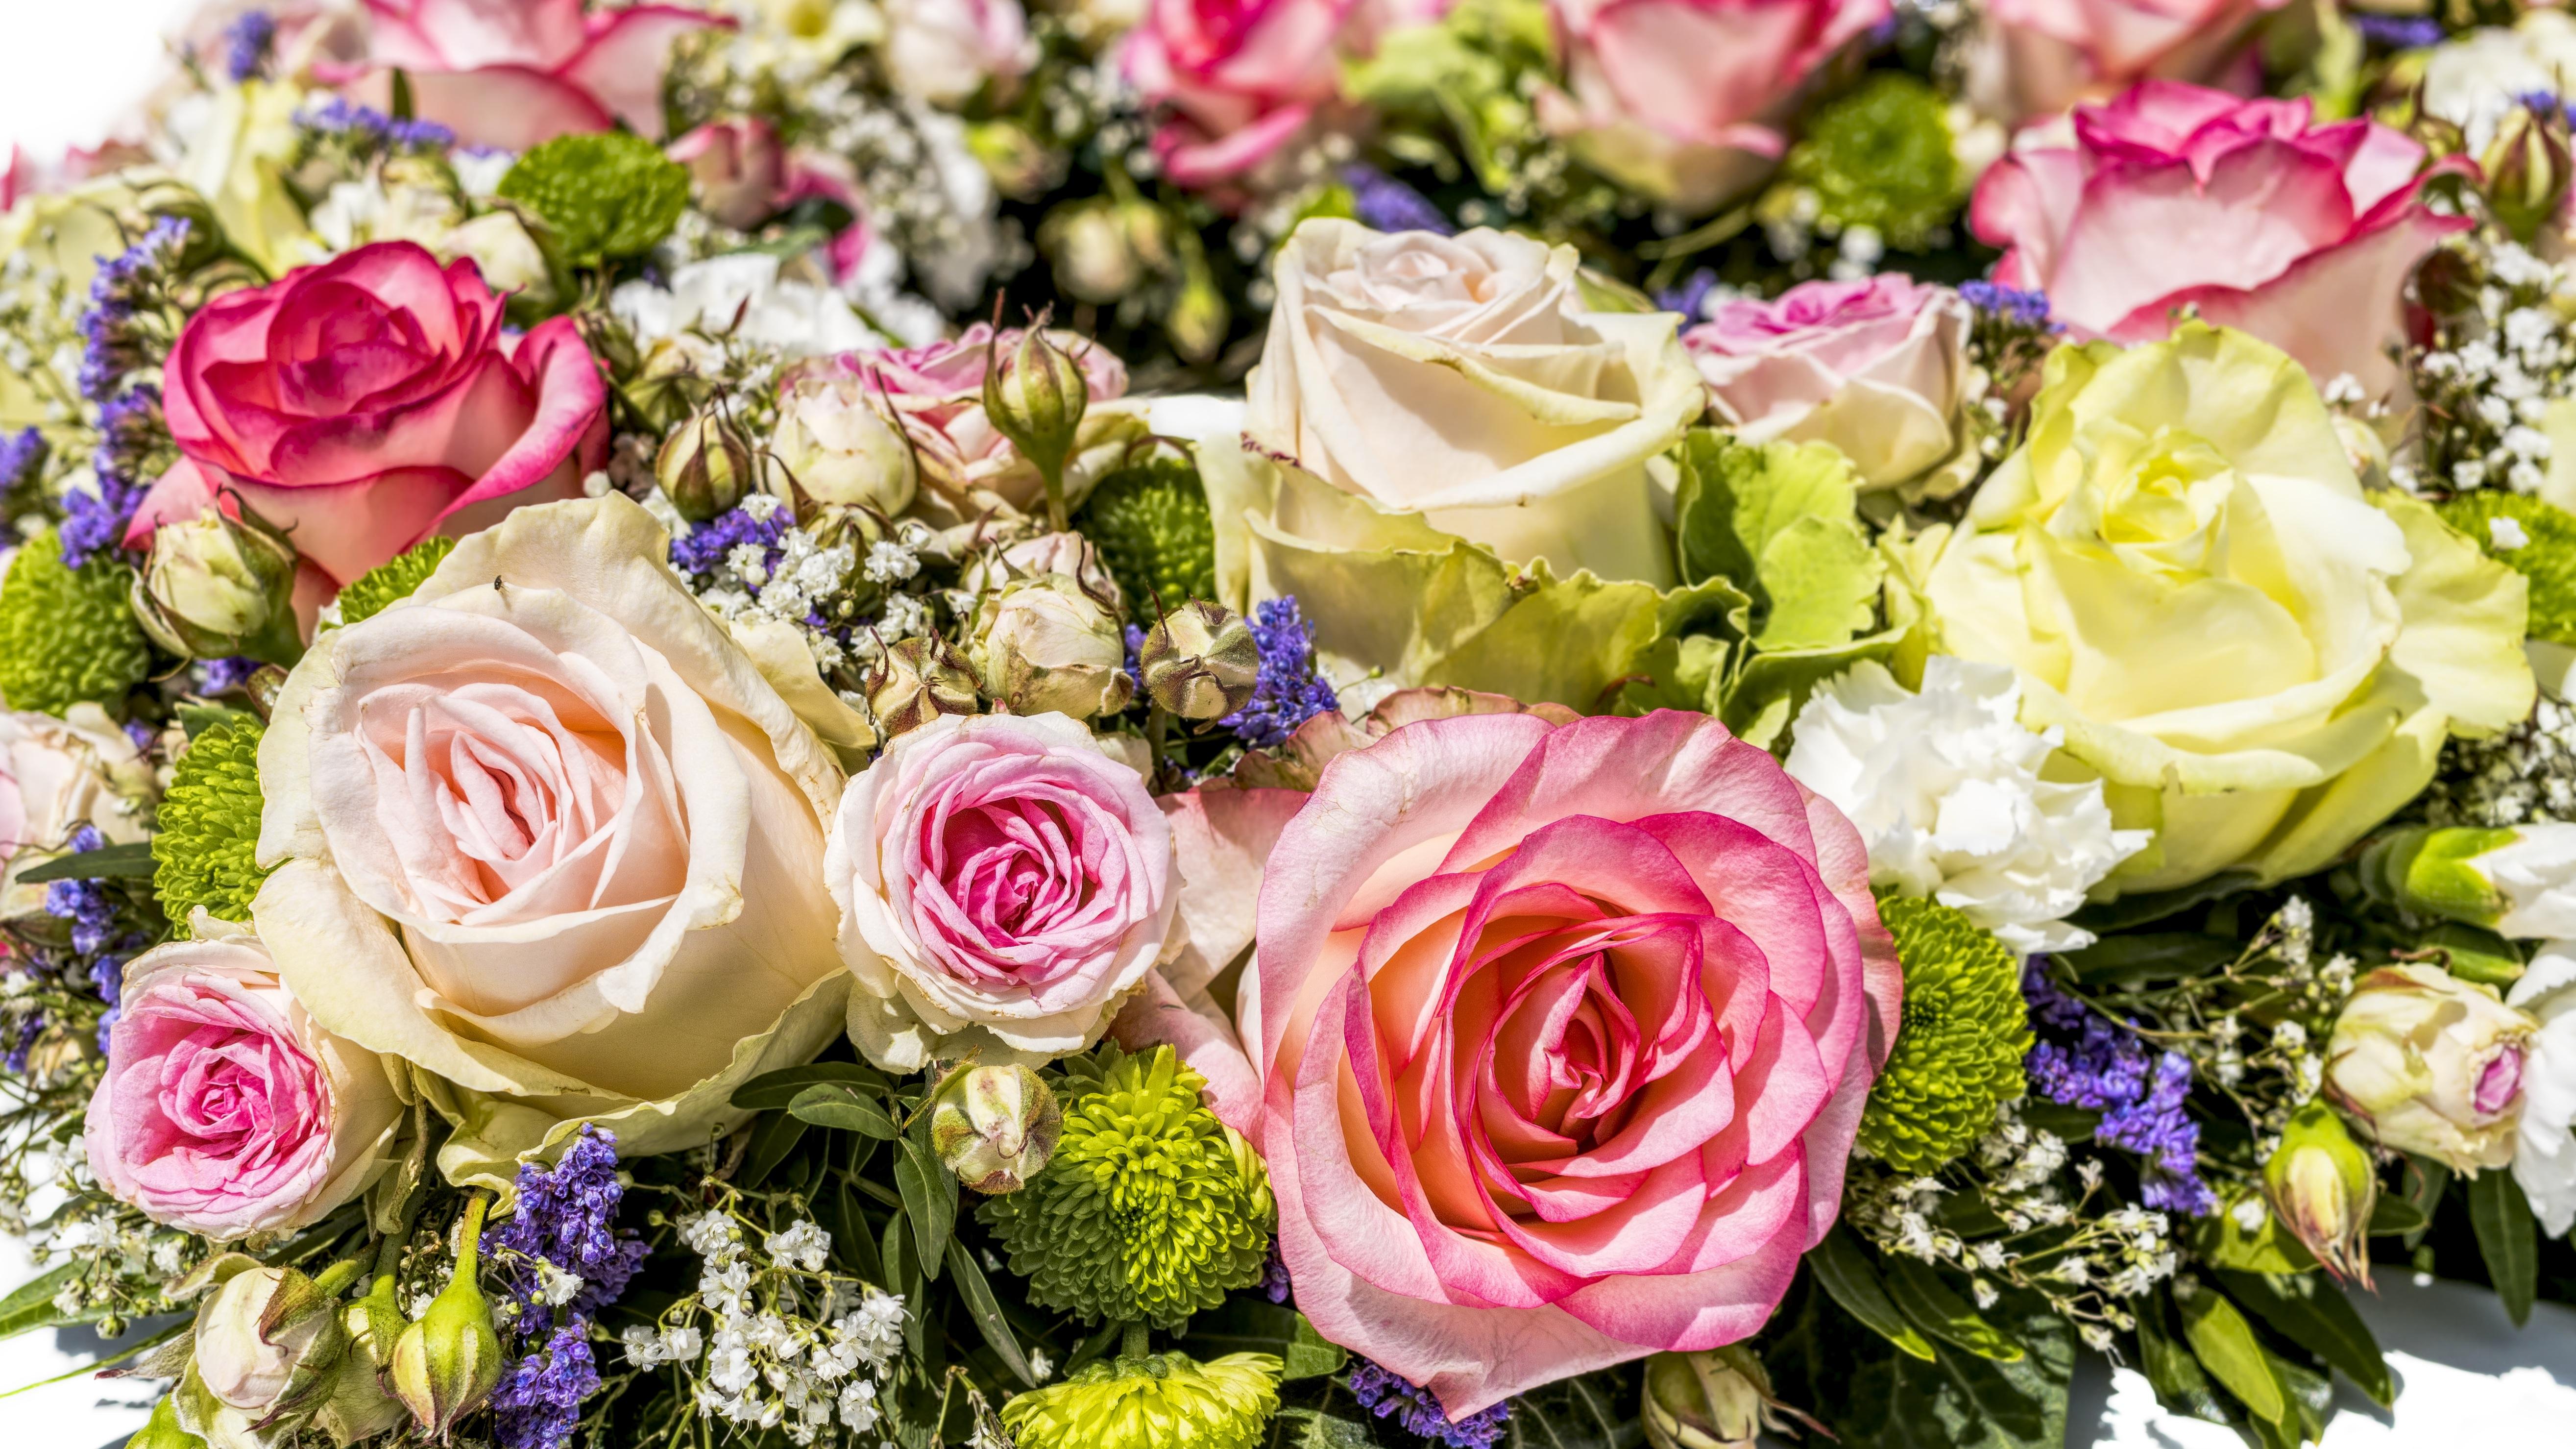 Flower Arranging Bouquet Floristry Pink Rose Cut Flowers Yellow Family Floral Design Flowering